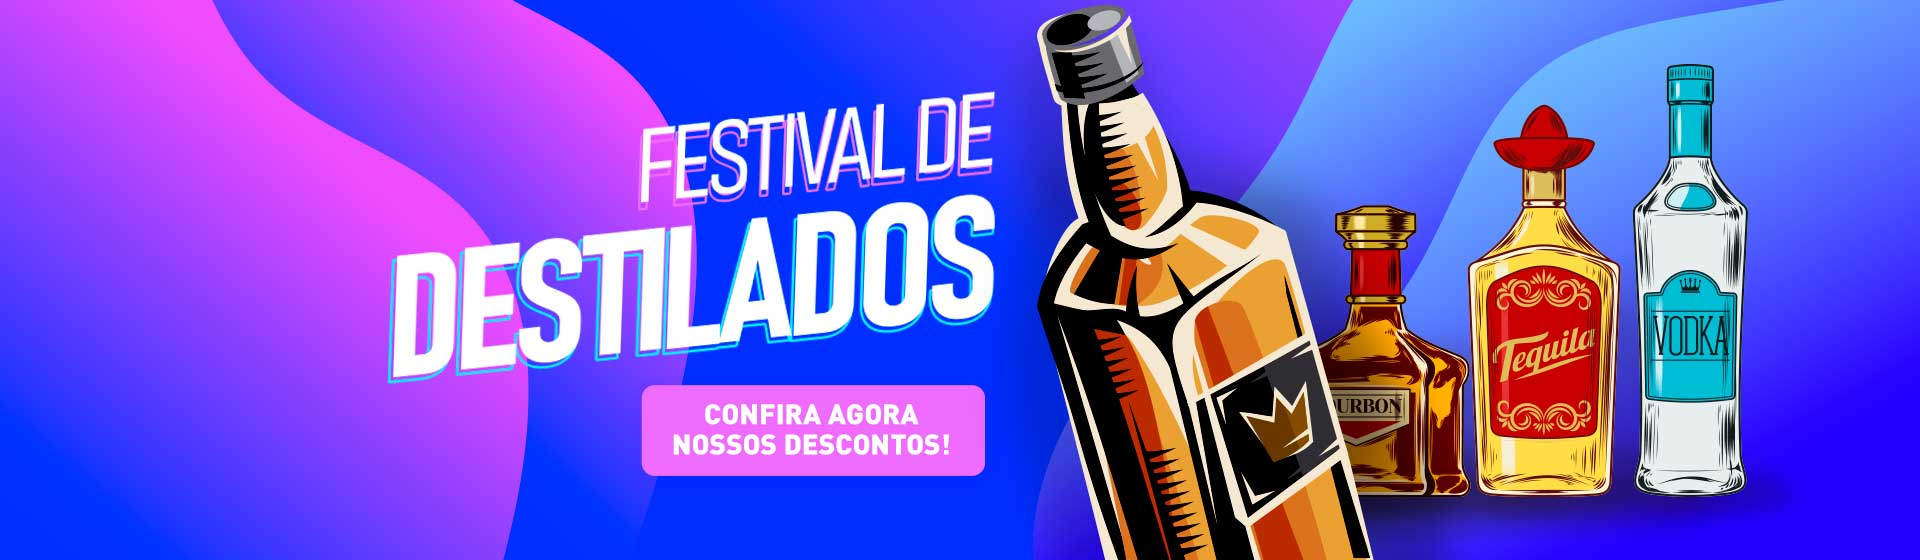 Festival de Destilados